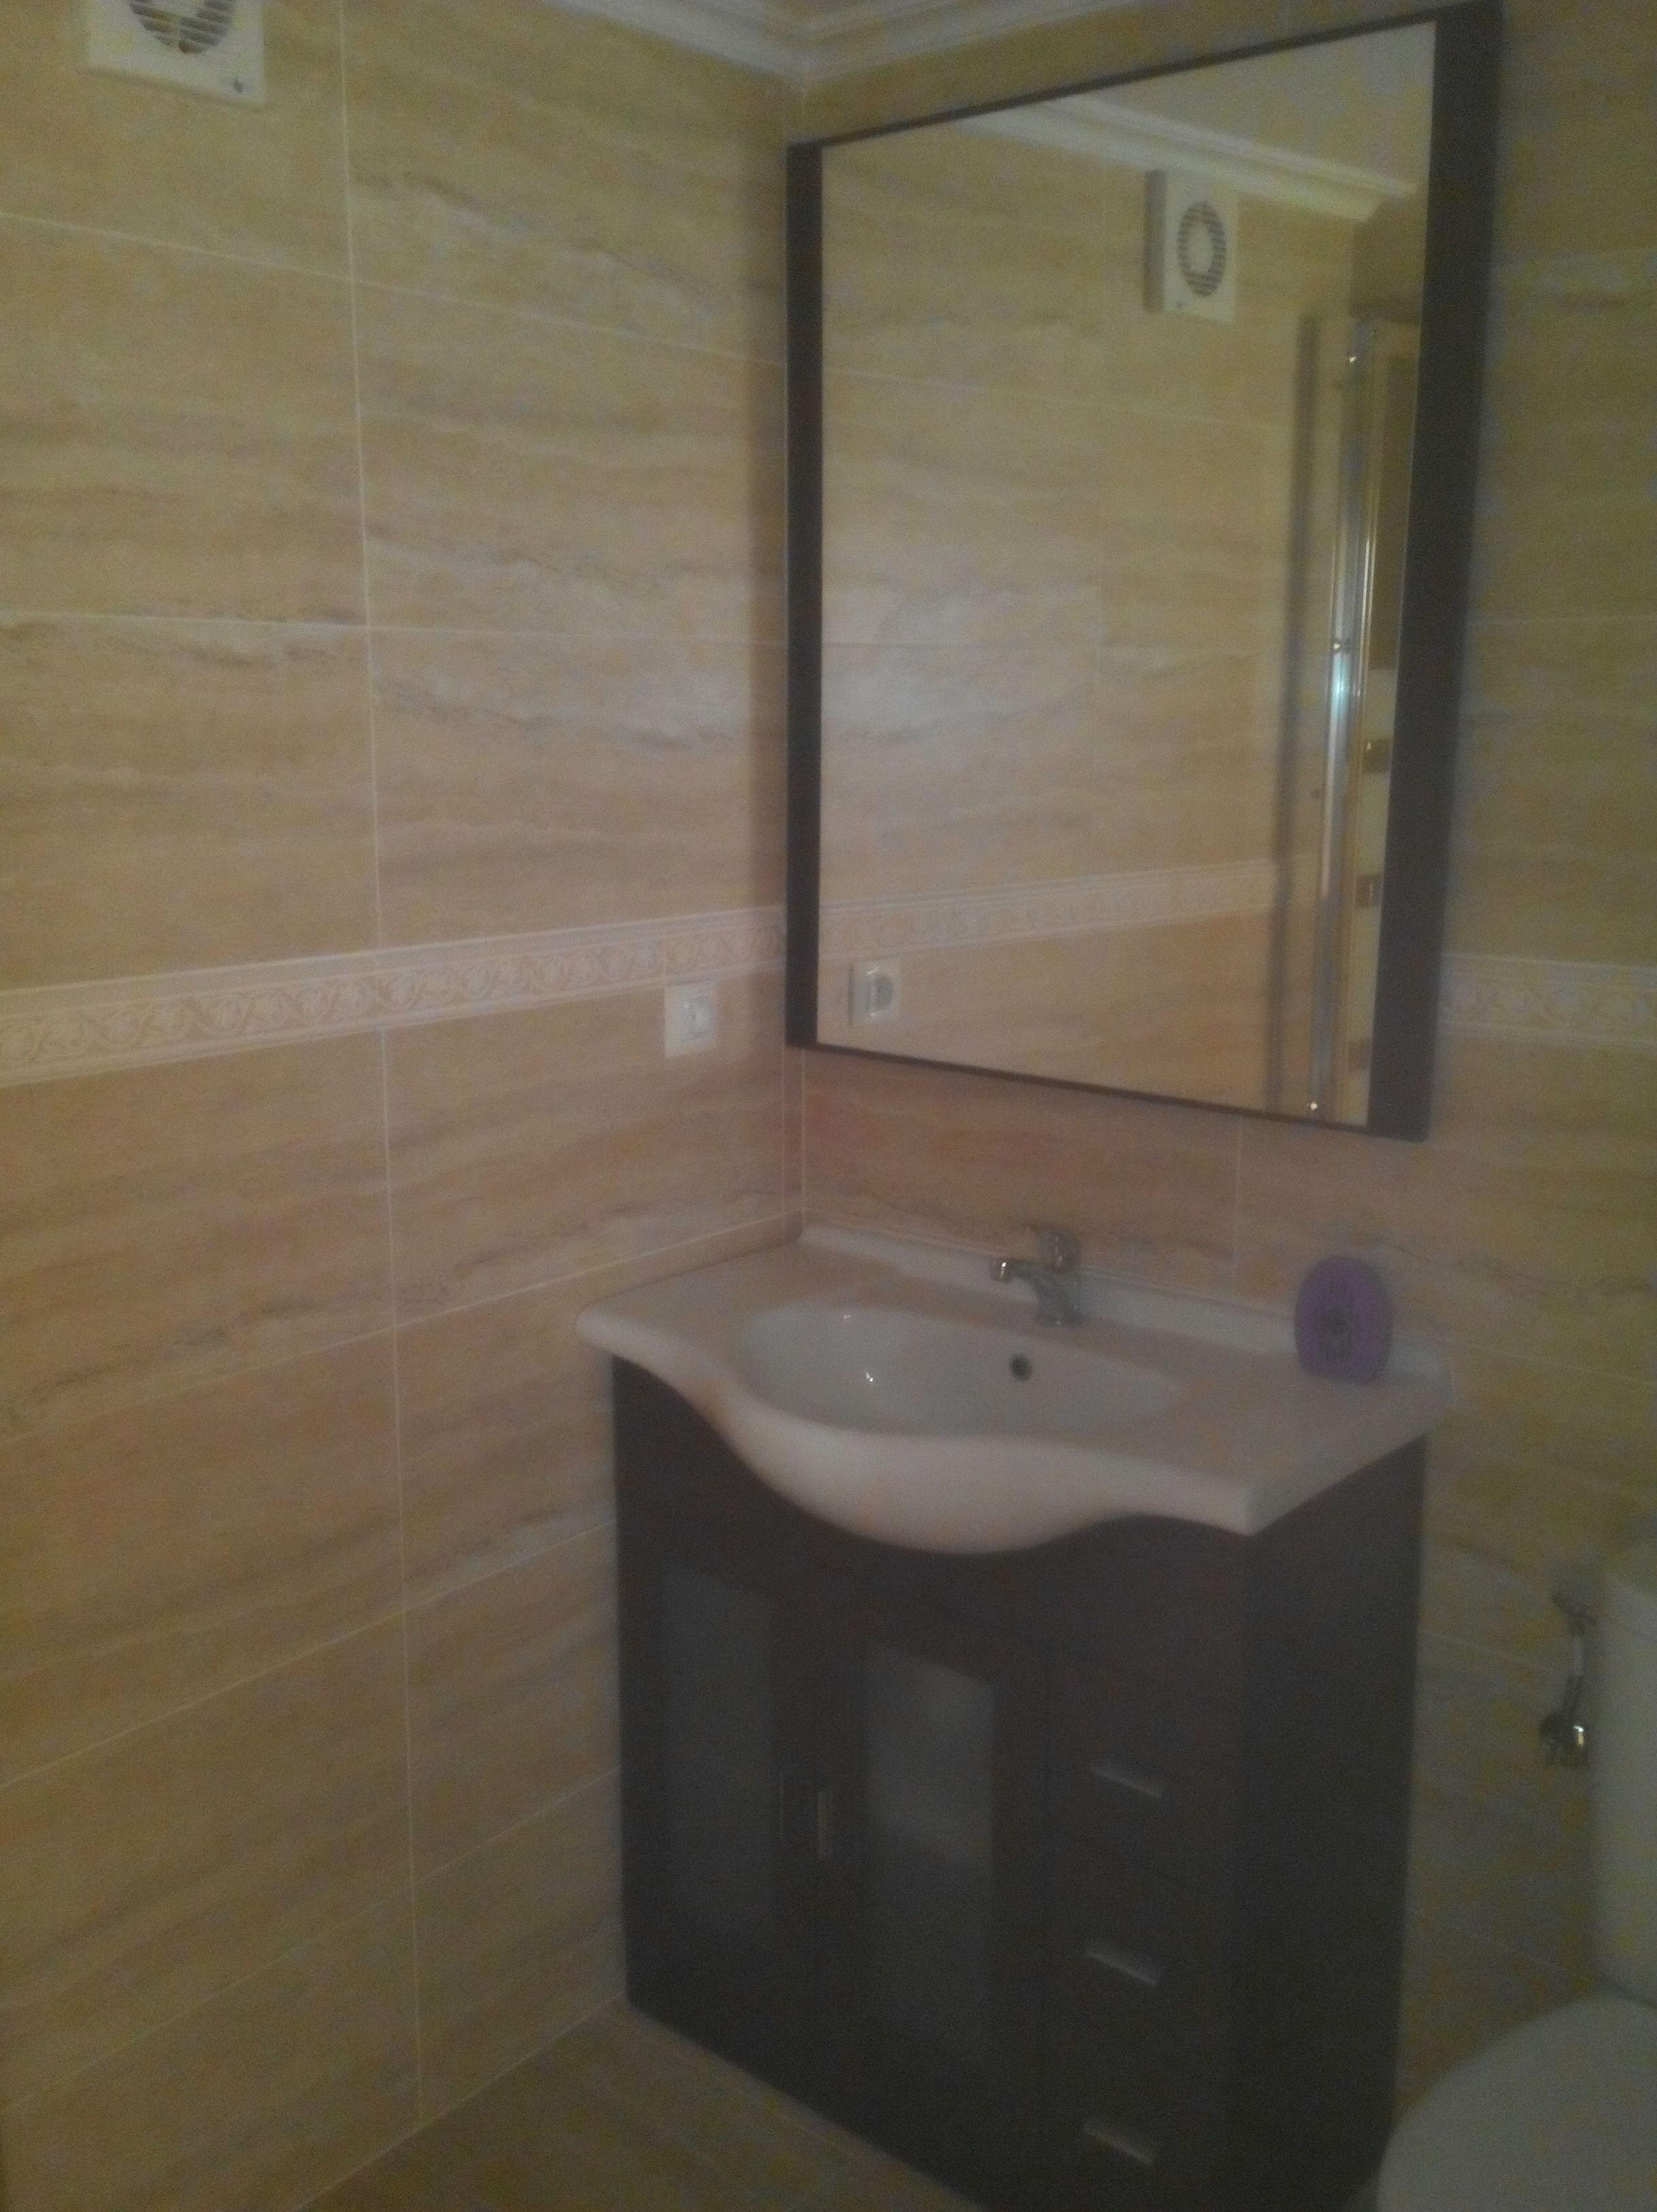 Foto 151 de Empresa de reformas en Oviedo | Asturcore